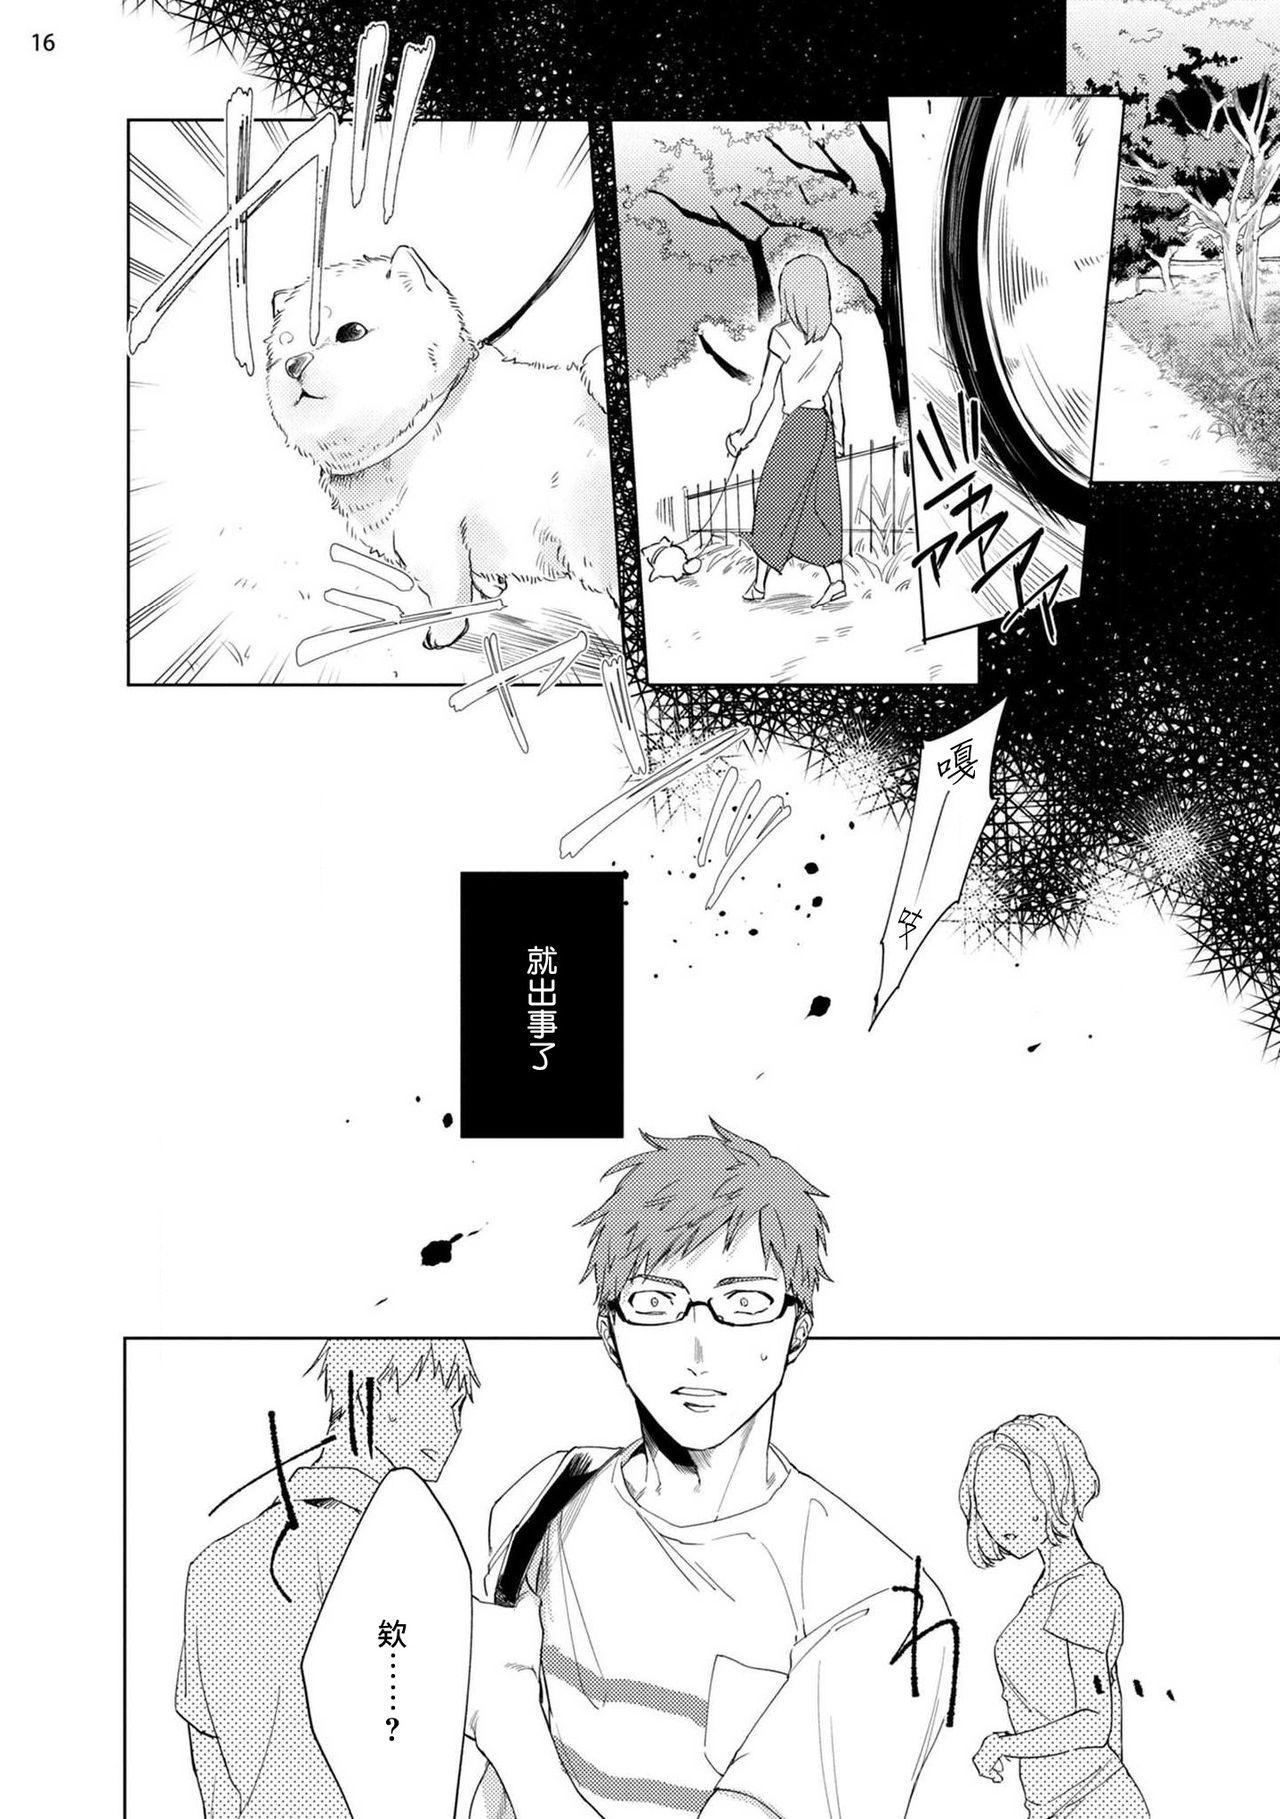 [Yao] Inma-sama ni Hallelujah!   赞美淫魔大人! Ch. 1-3 [Chinese] [拾荒者汉化组] [Digital] 86